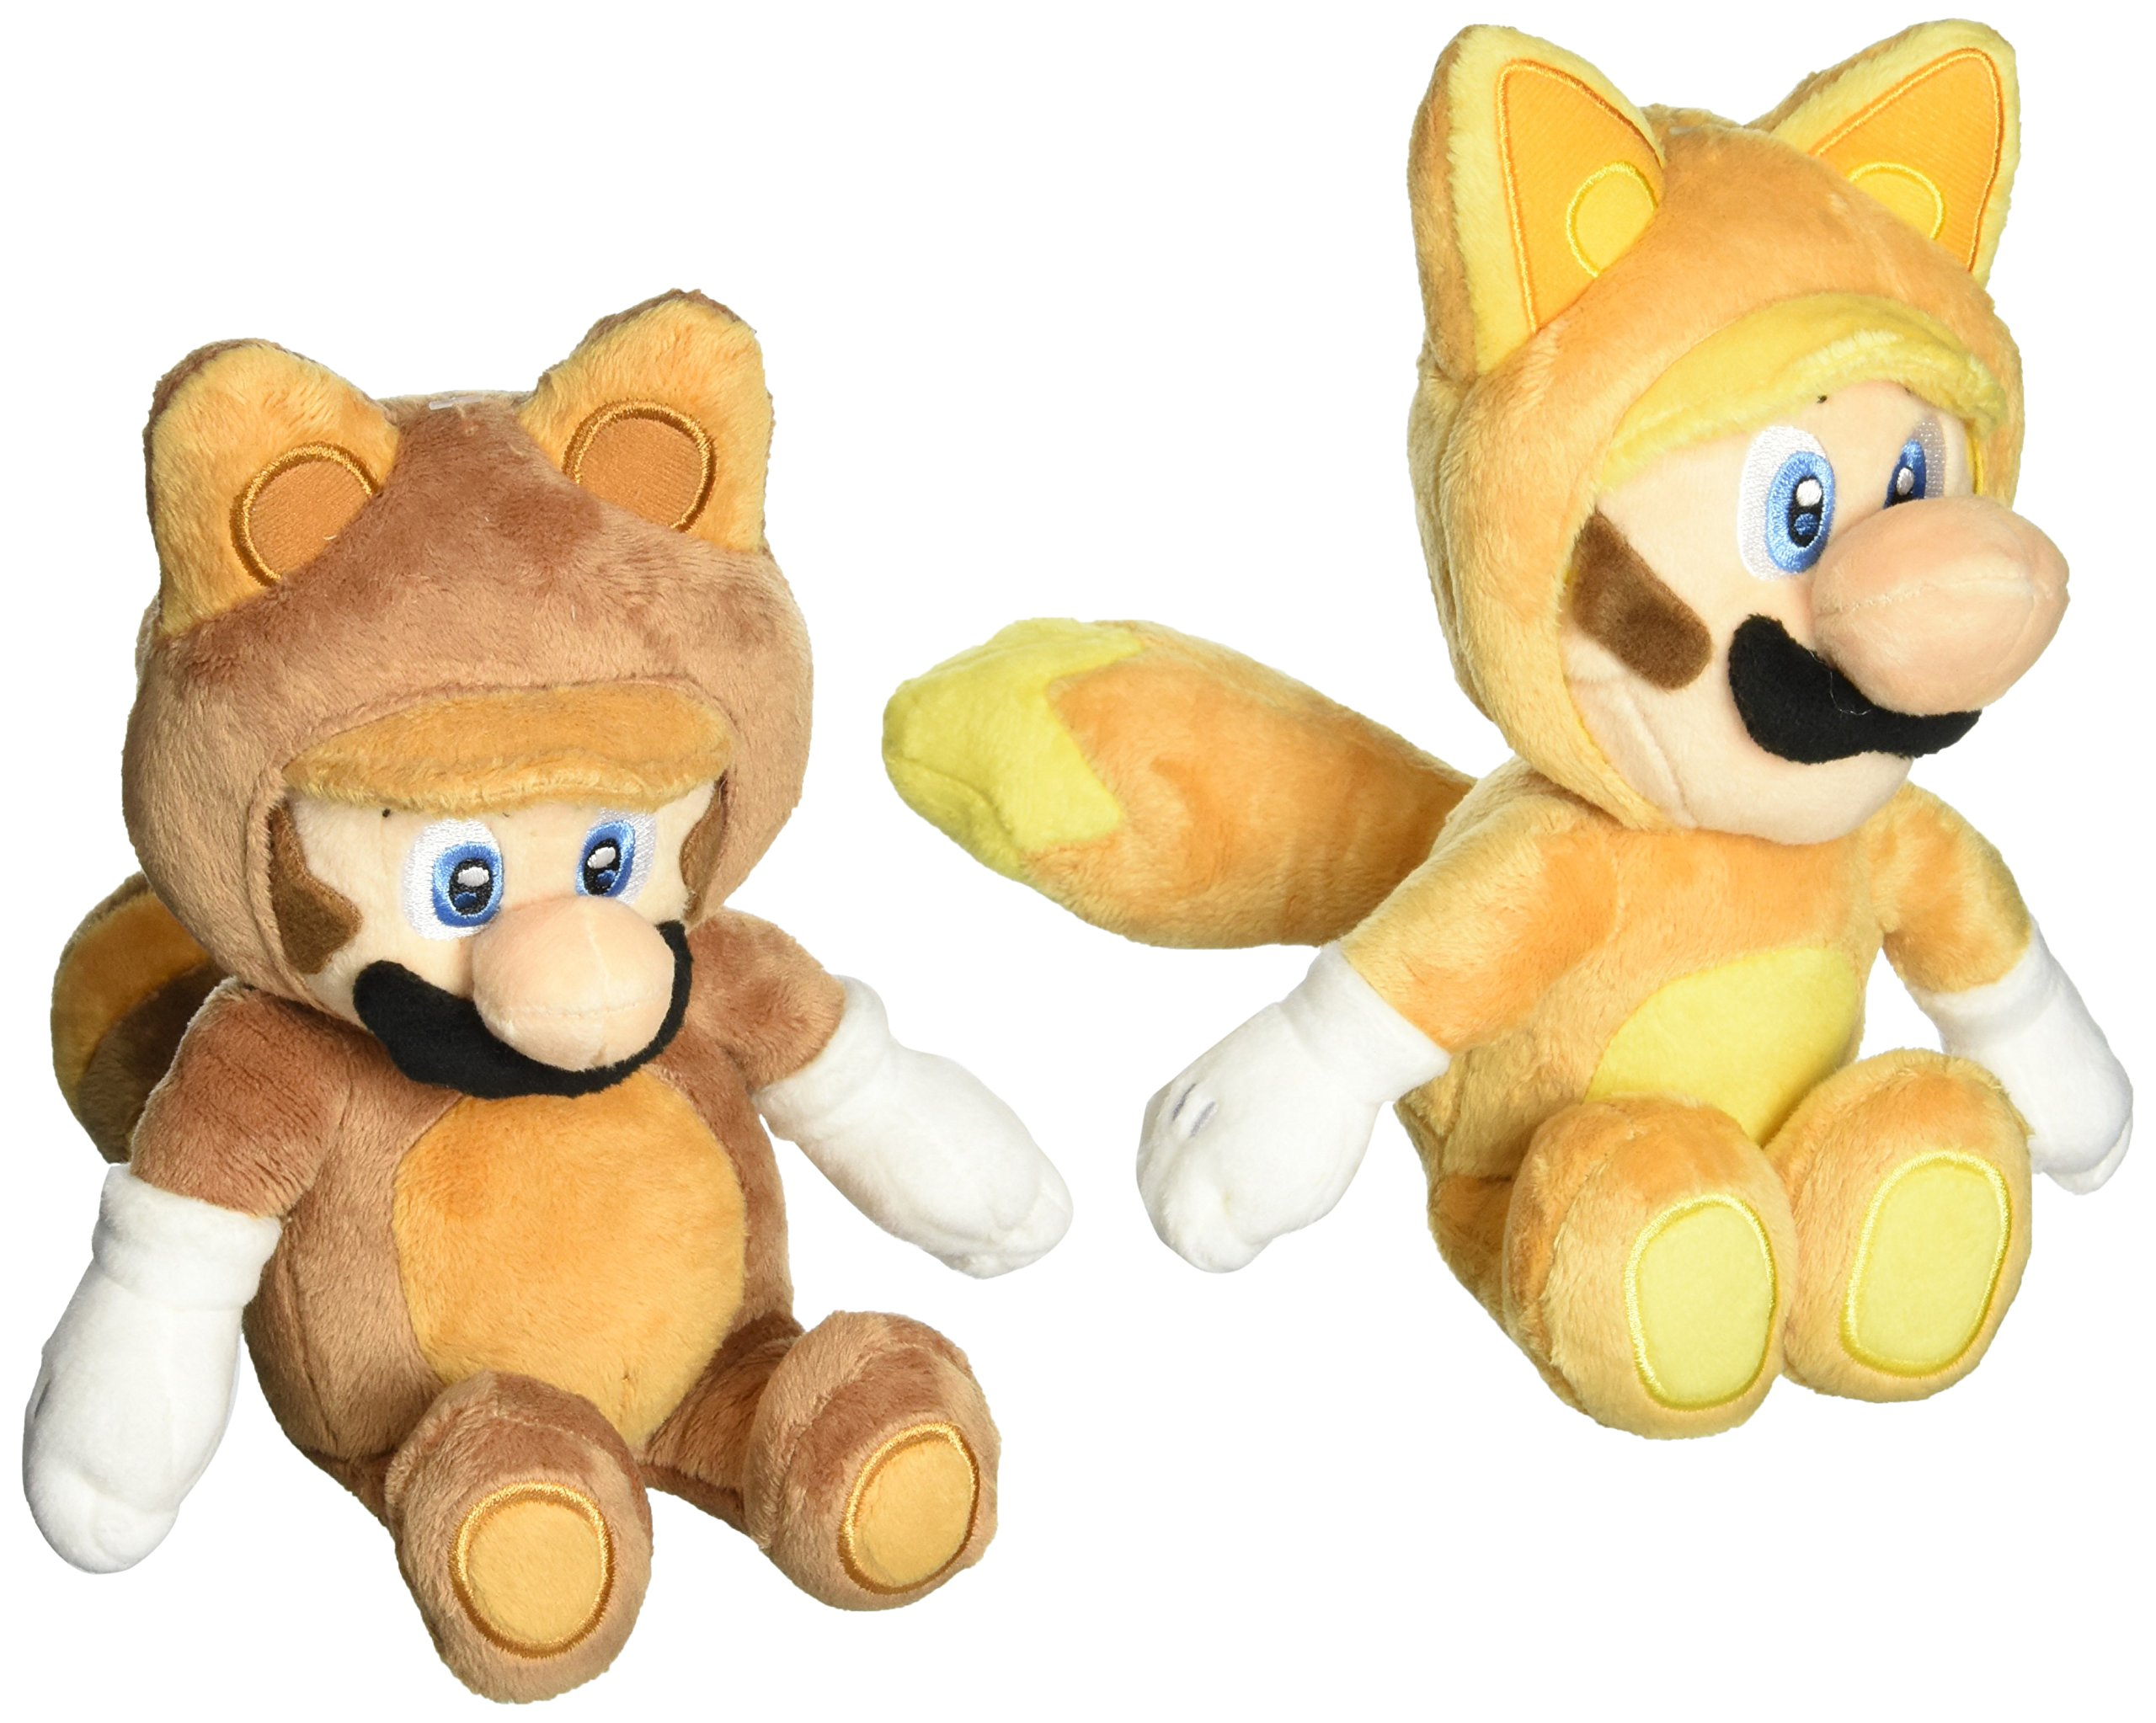 Little Buddy Set of 2 Super Mario Plush Doll - Kitsune Fox Luigi & Raccoon Tanooki Mario by Little Buddy